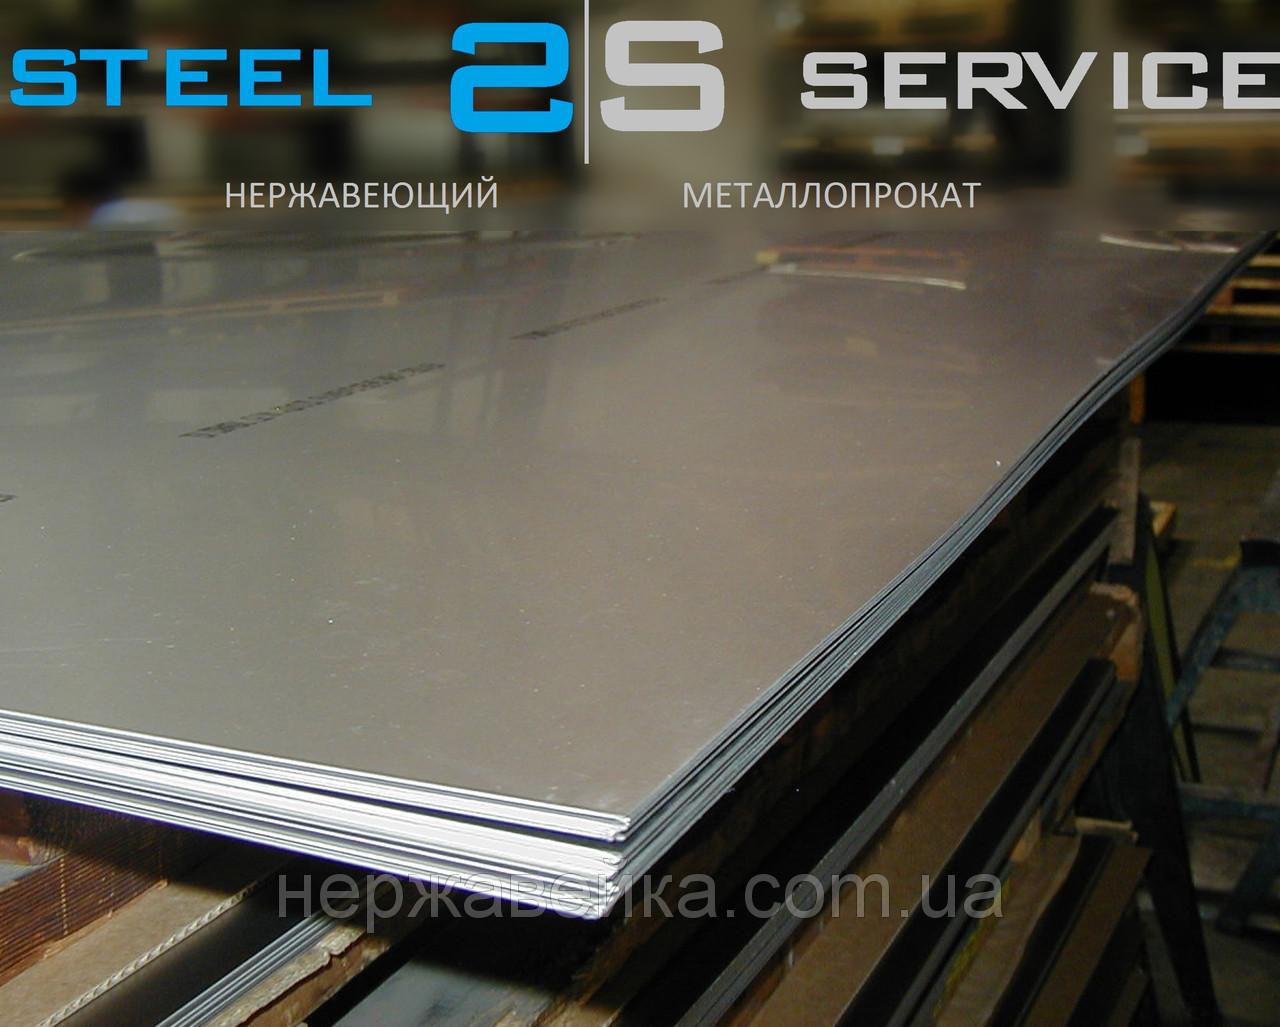 Нержавеющий лист 1х1250х2500мм  AISI 316Ti(10Х17Н13М2Т) BA - зеркало,  кислотостойкий